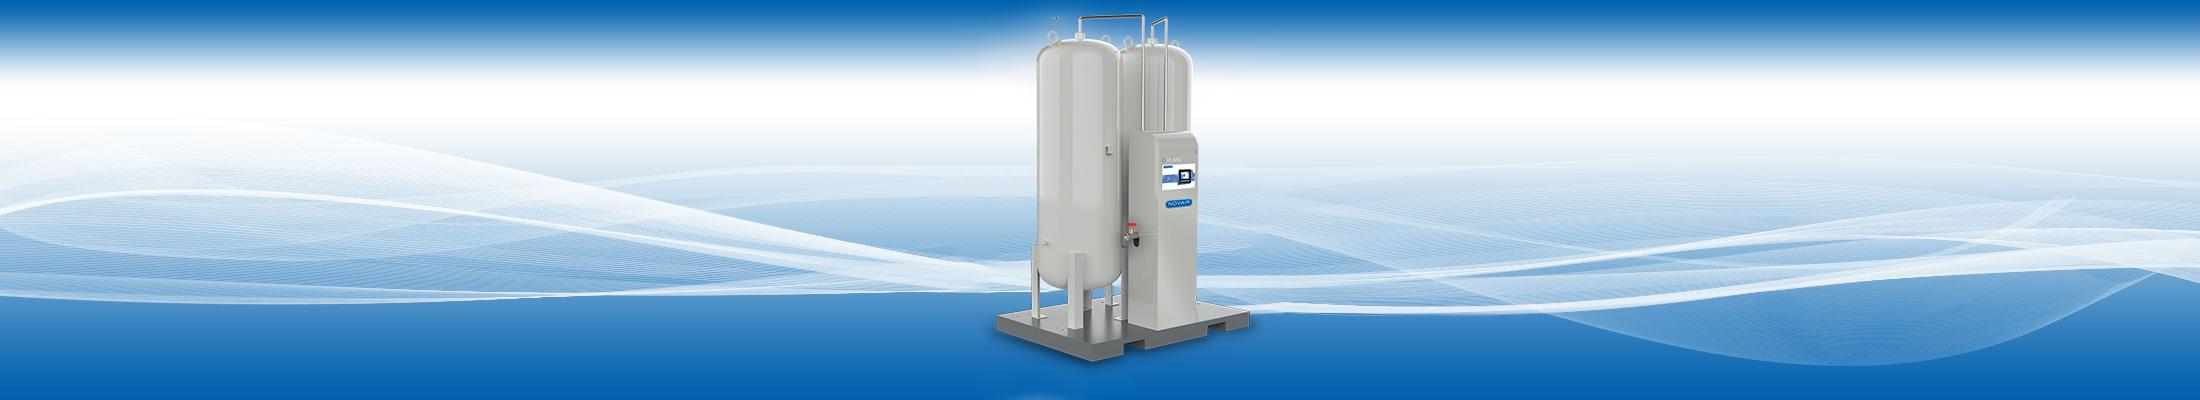 93% - Twin Tower PSA Oxygen Generator